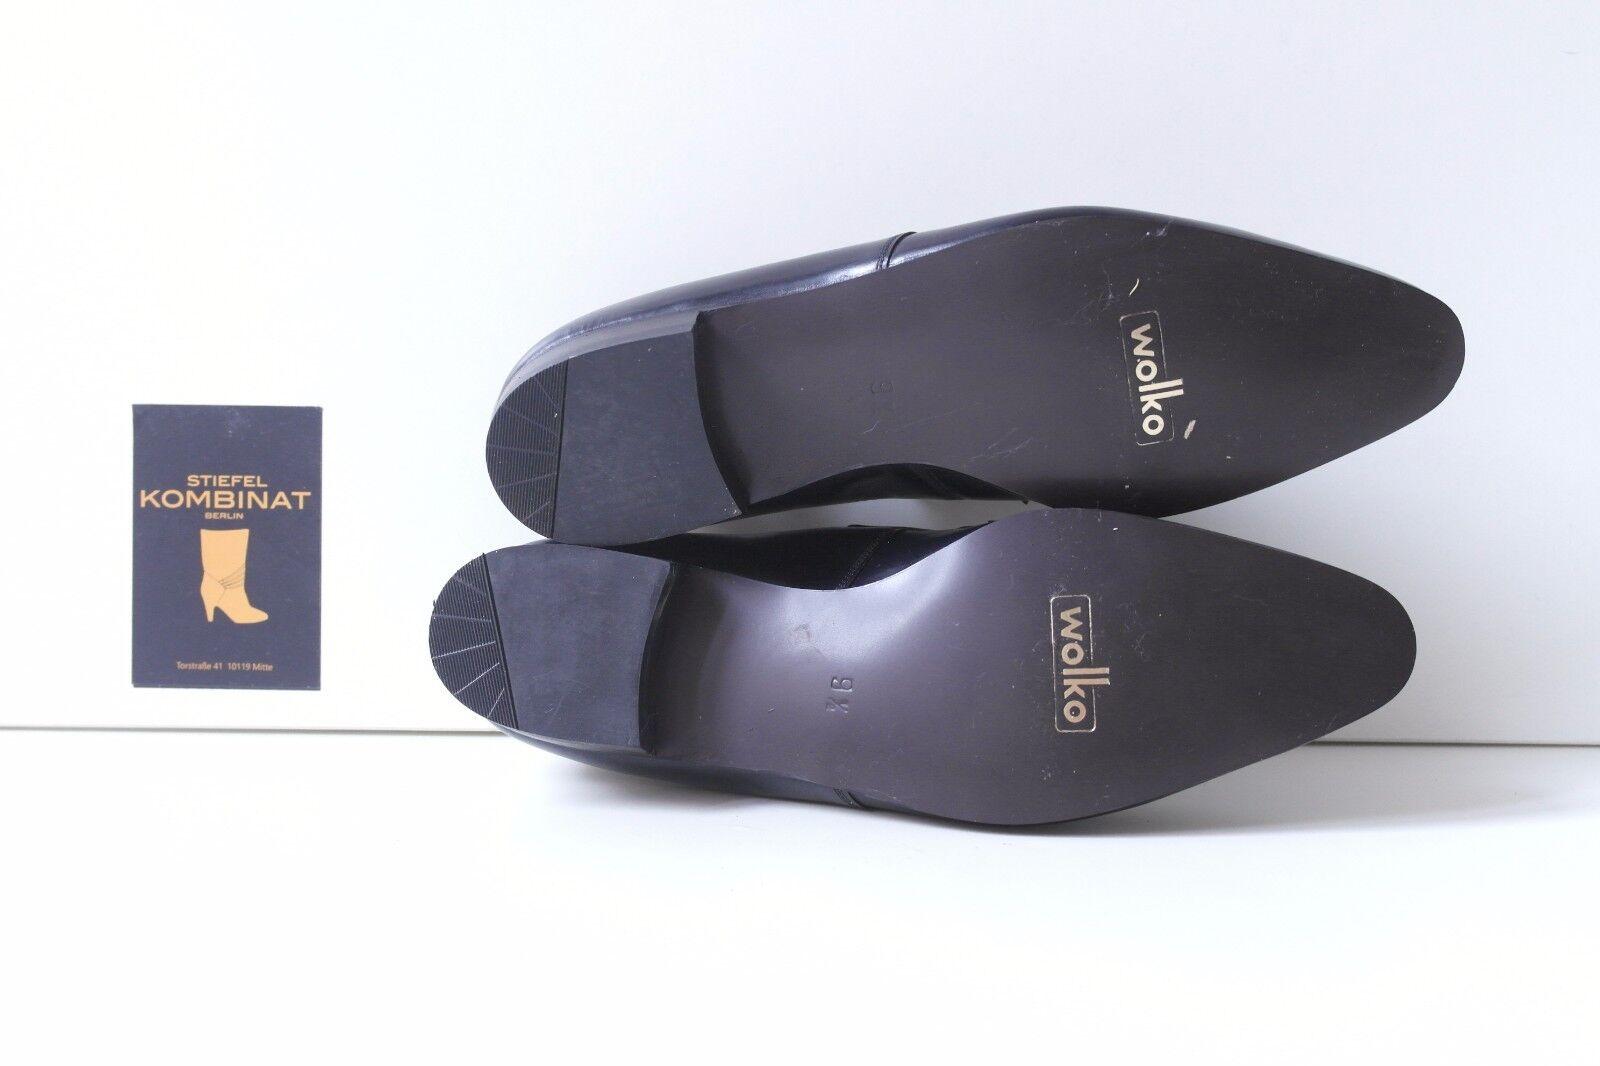 True Vintage Vintage Vintage wolko Kent antico 60er normalissime scarpe da uomo scarpe basse Loafer | Ordini Sono Benvenuti  | Gentiluomo/Signora Scarpa  79d2ce